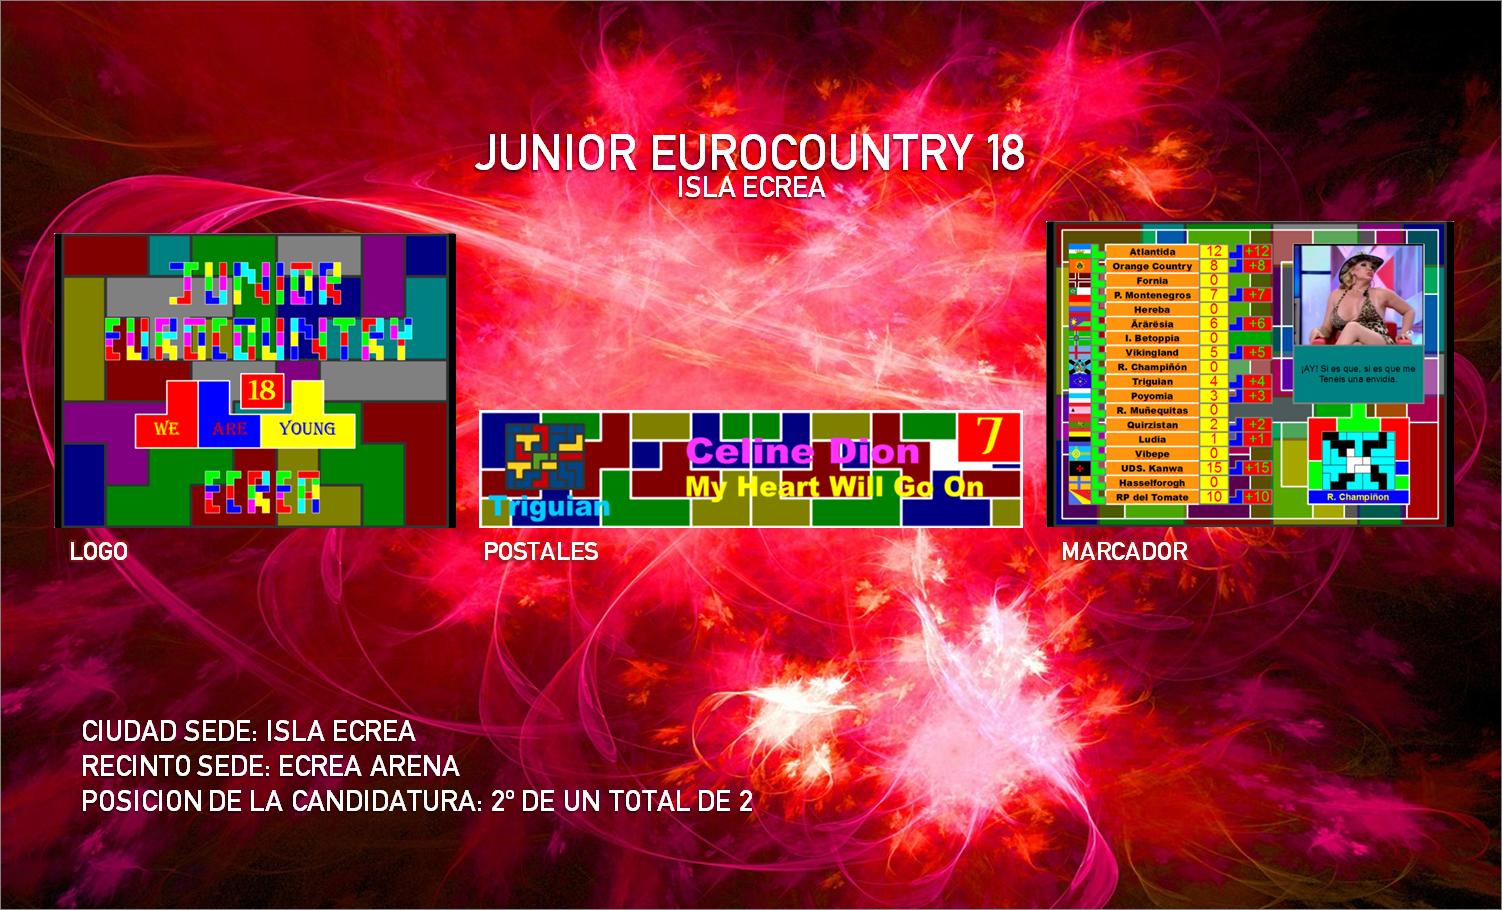 [RESULTADOS] Junior Eurocountry 29 | ¡Hora de pasar el testigo! S4GV9uh